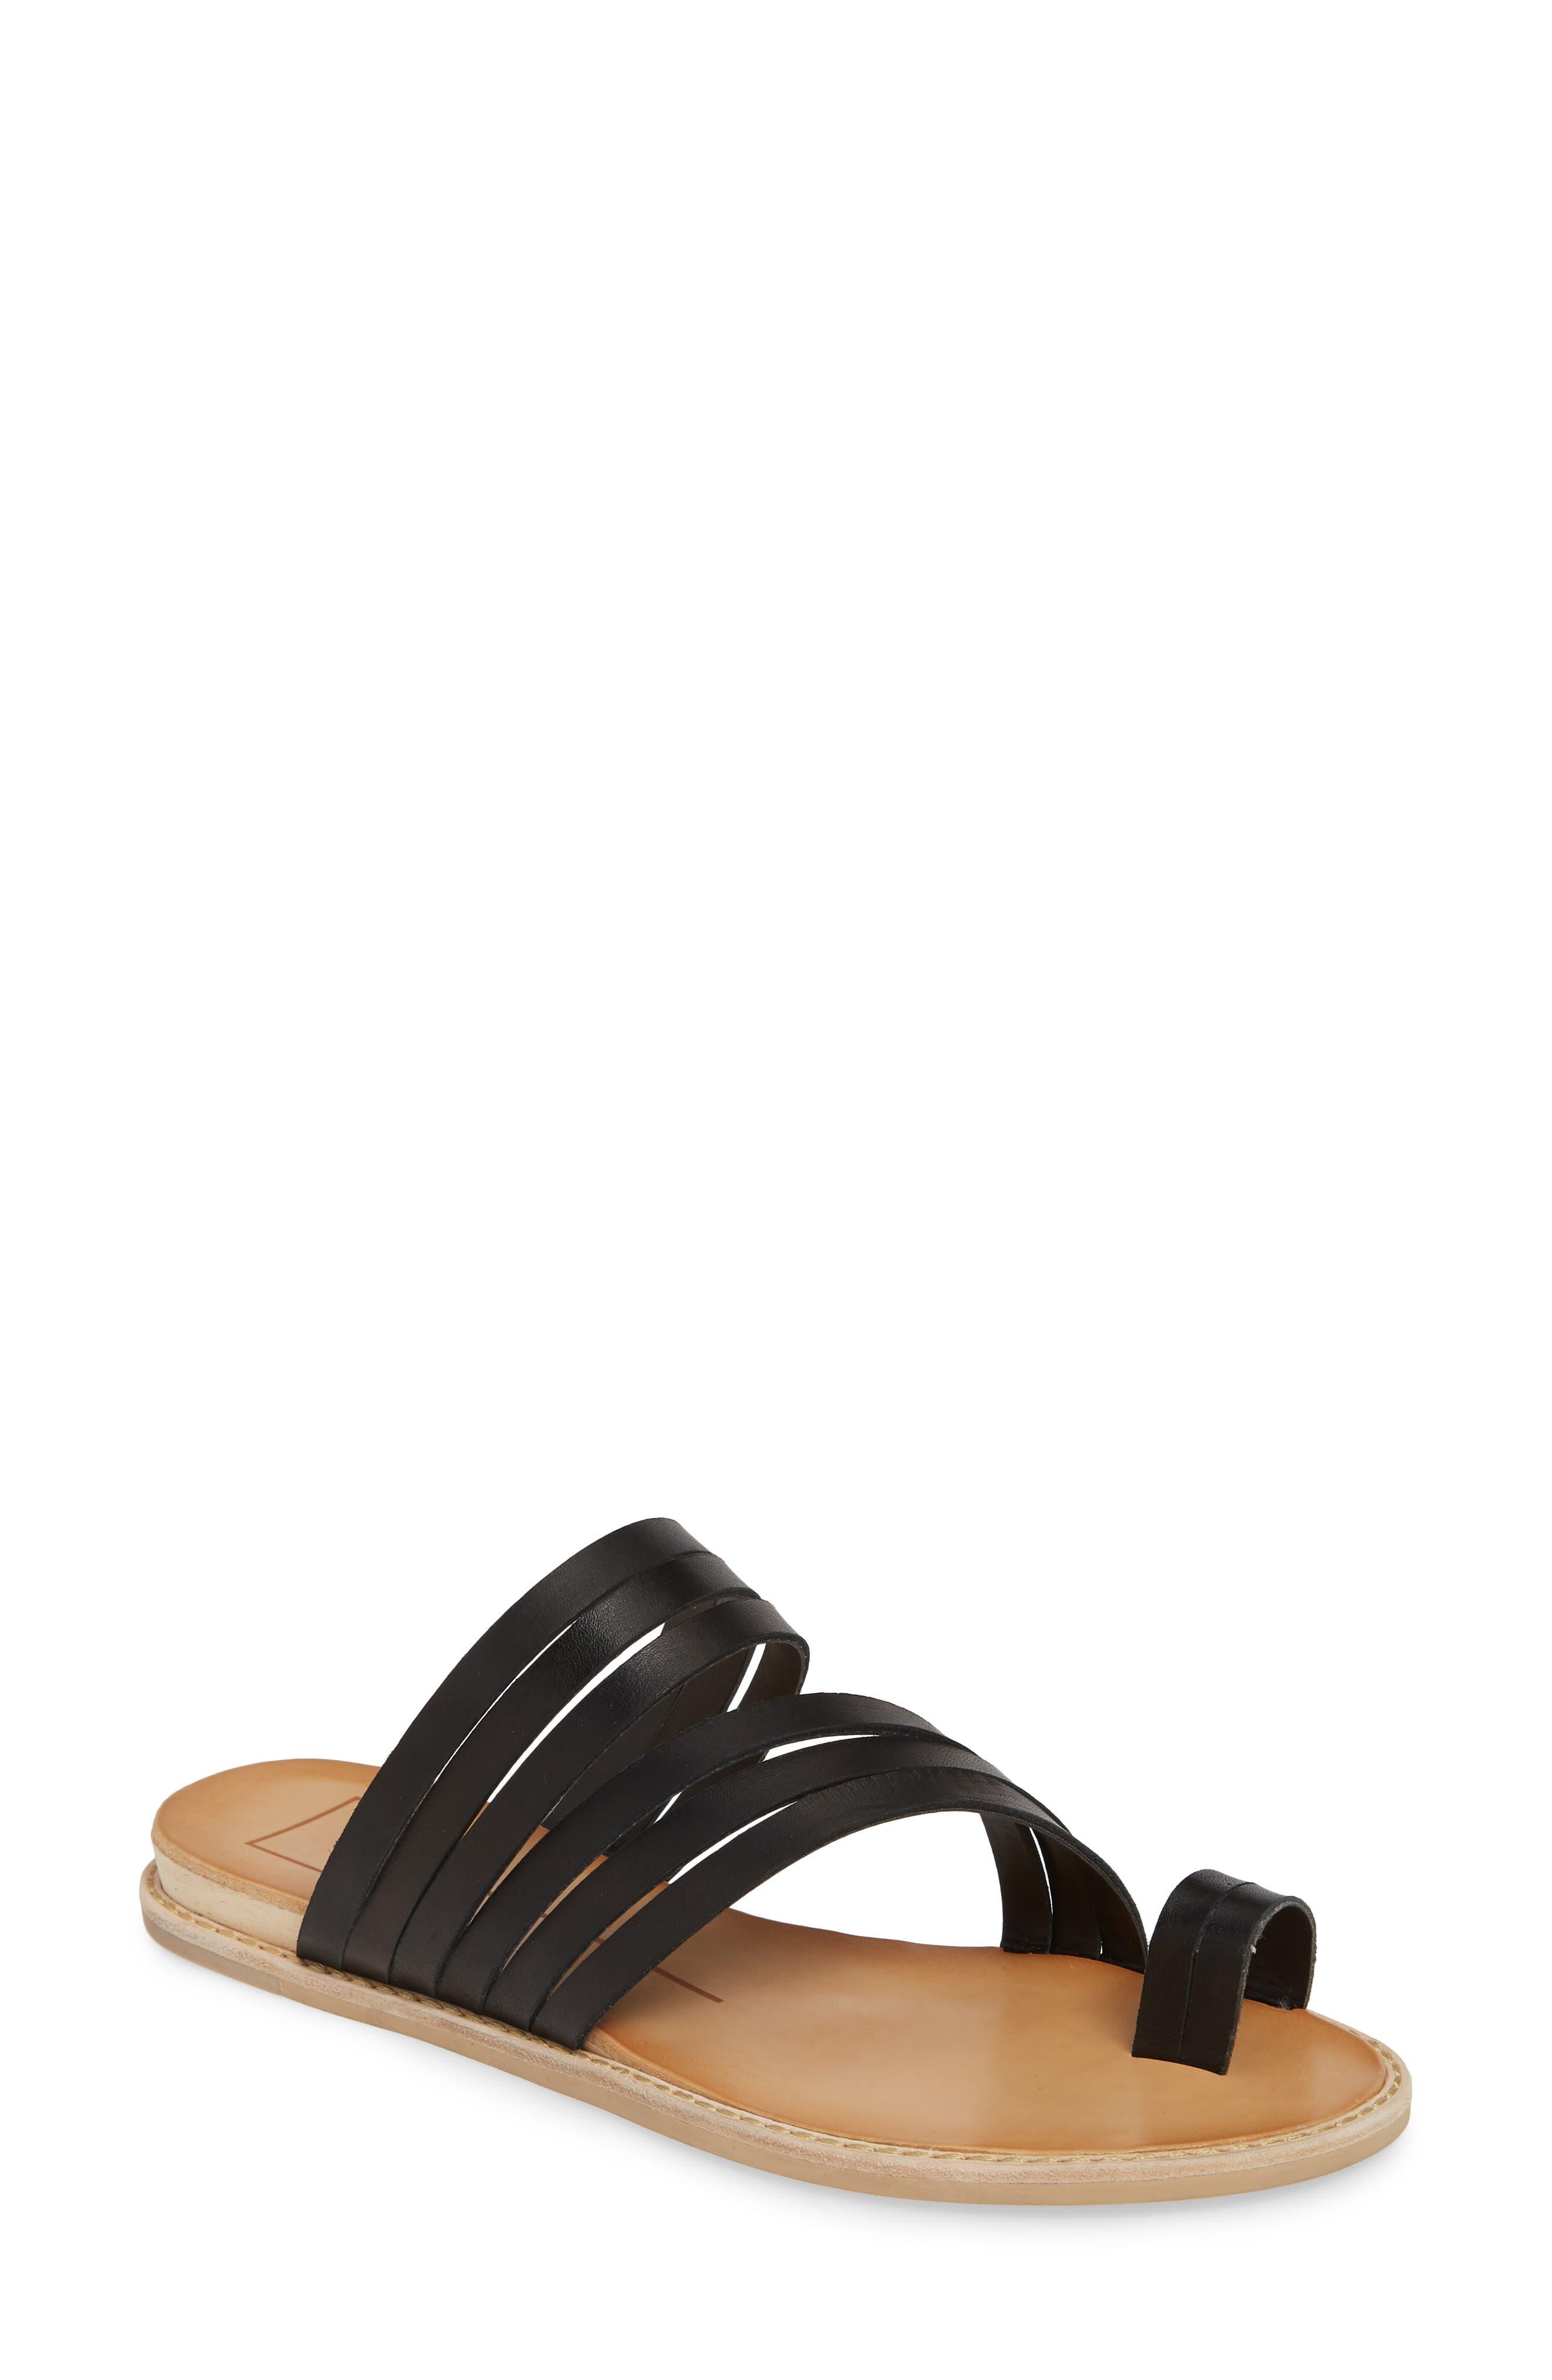 DOLCE VITA Nelly Slide Sandal, Main, color, BLACK LEATHER